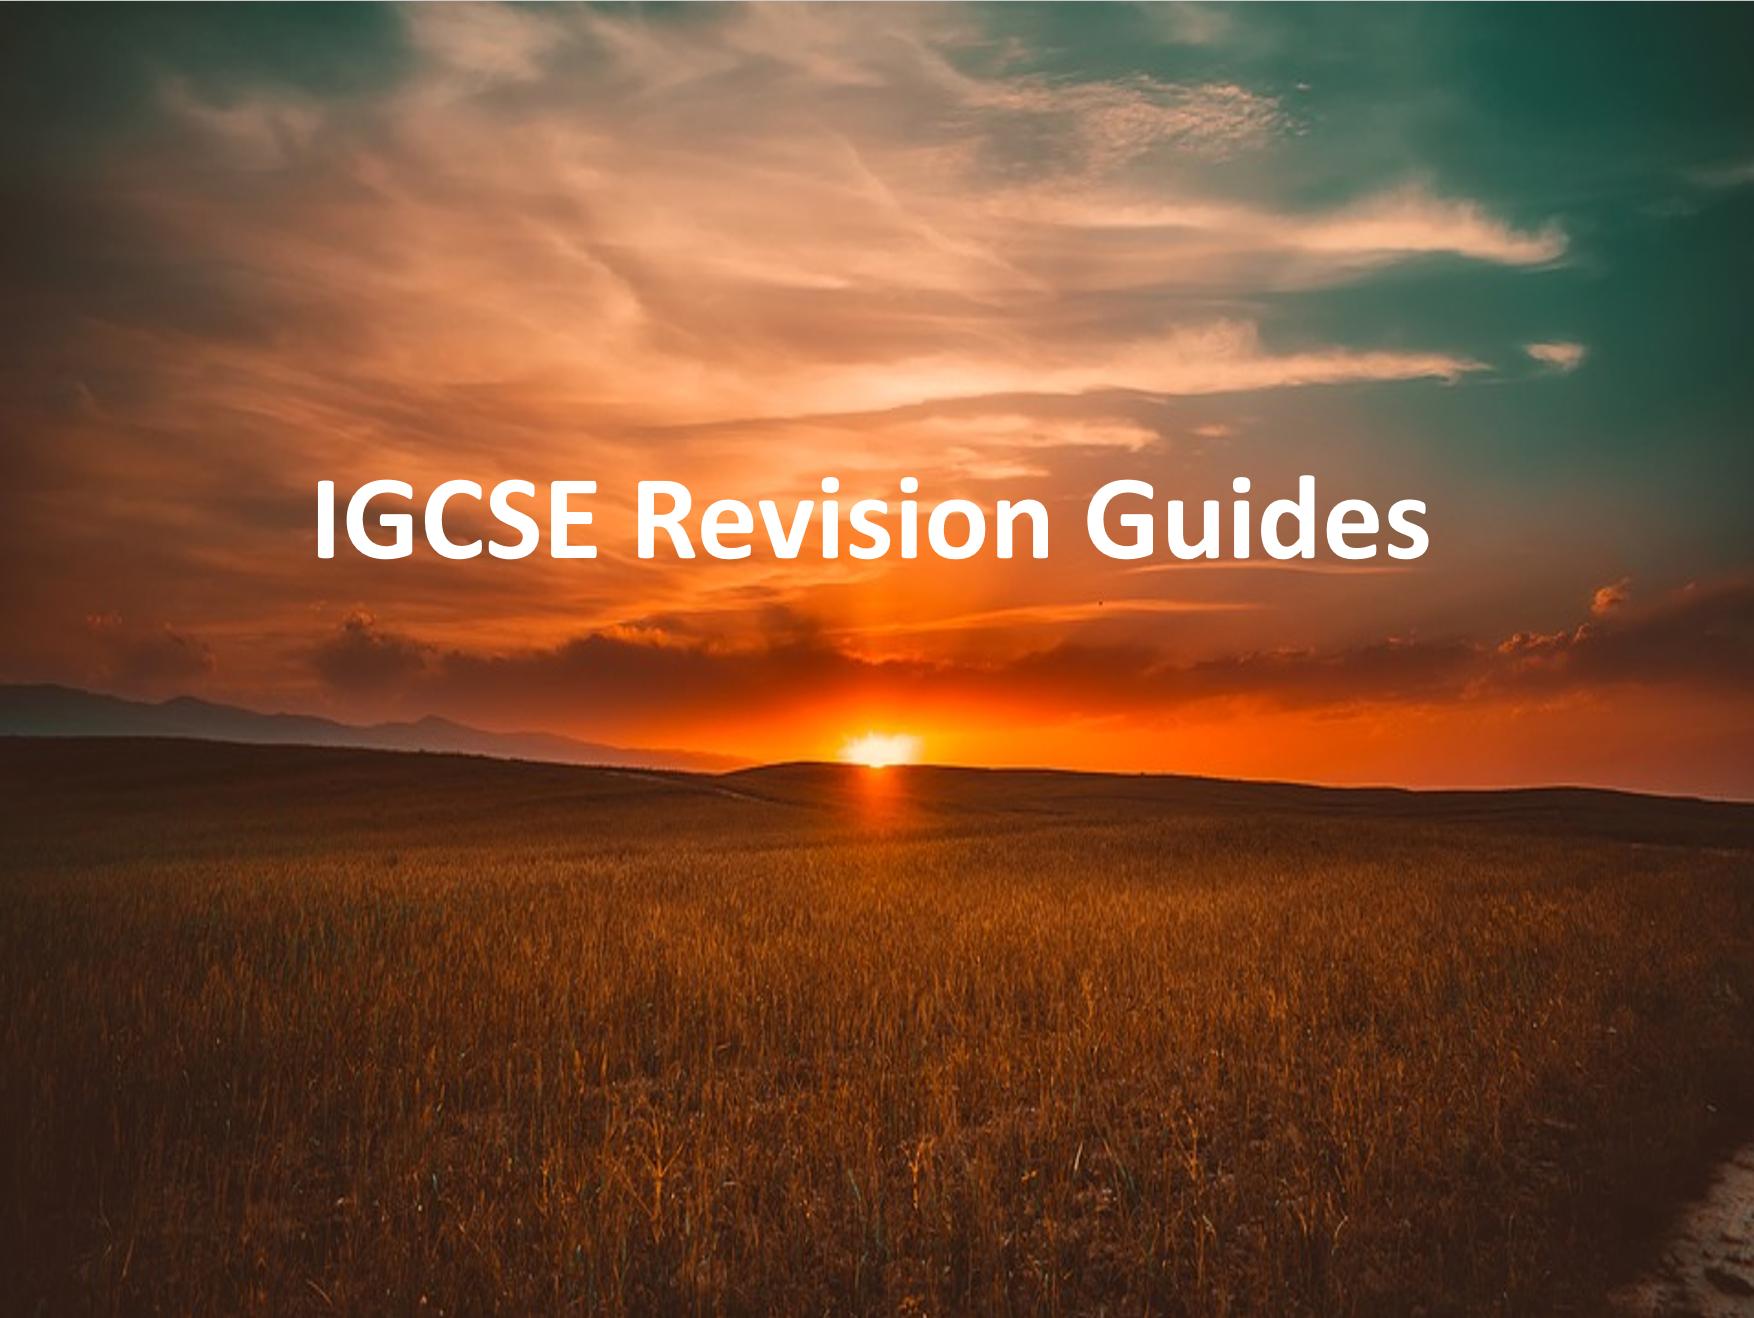 IGCSE Revision Guides